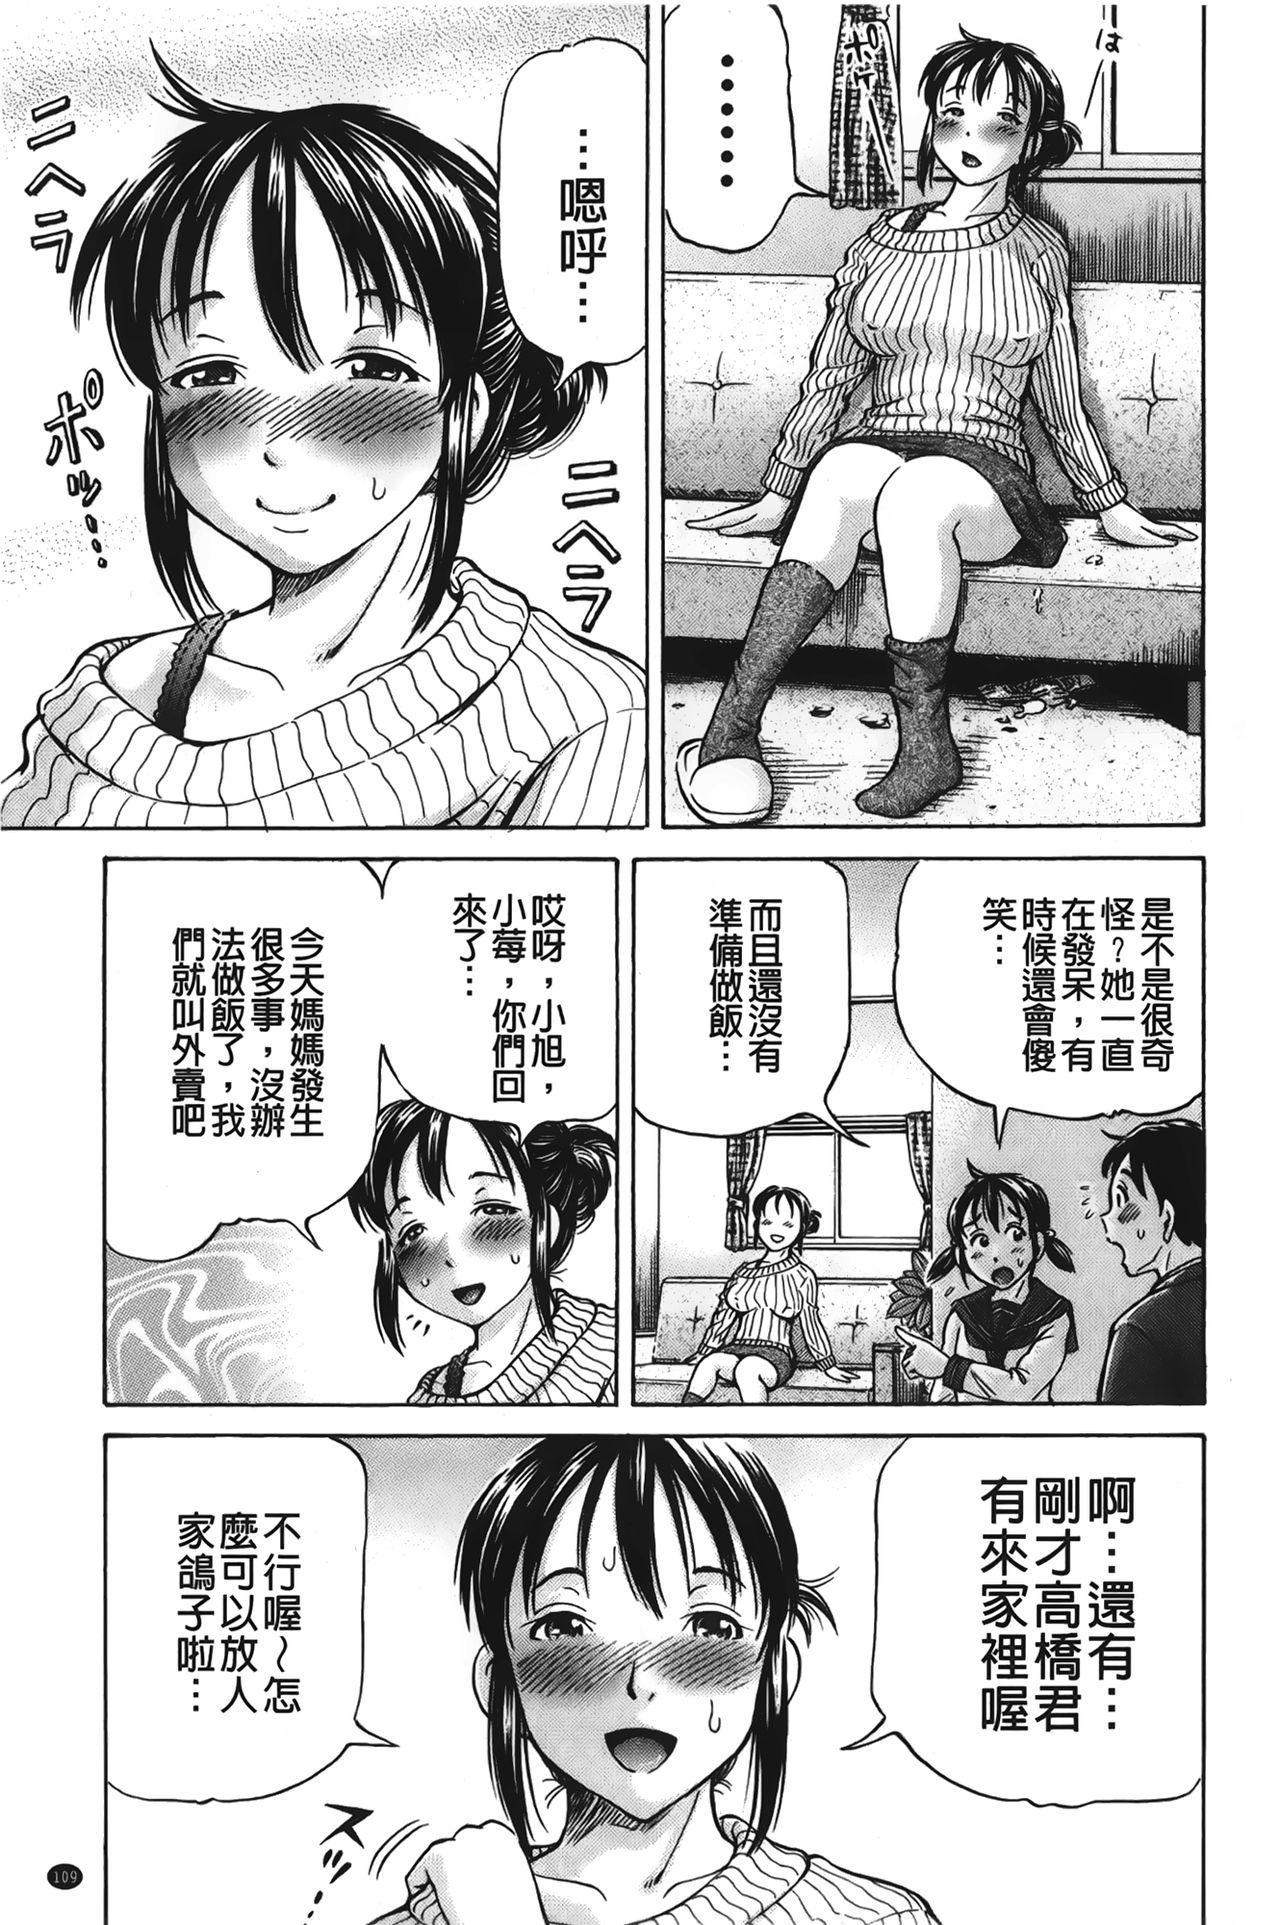 pookori meikingu | 懷孕少女的製造者 109